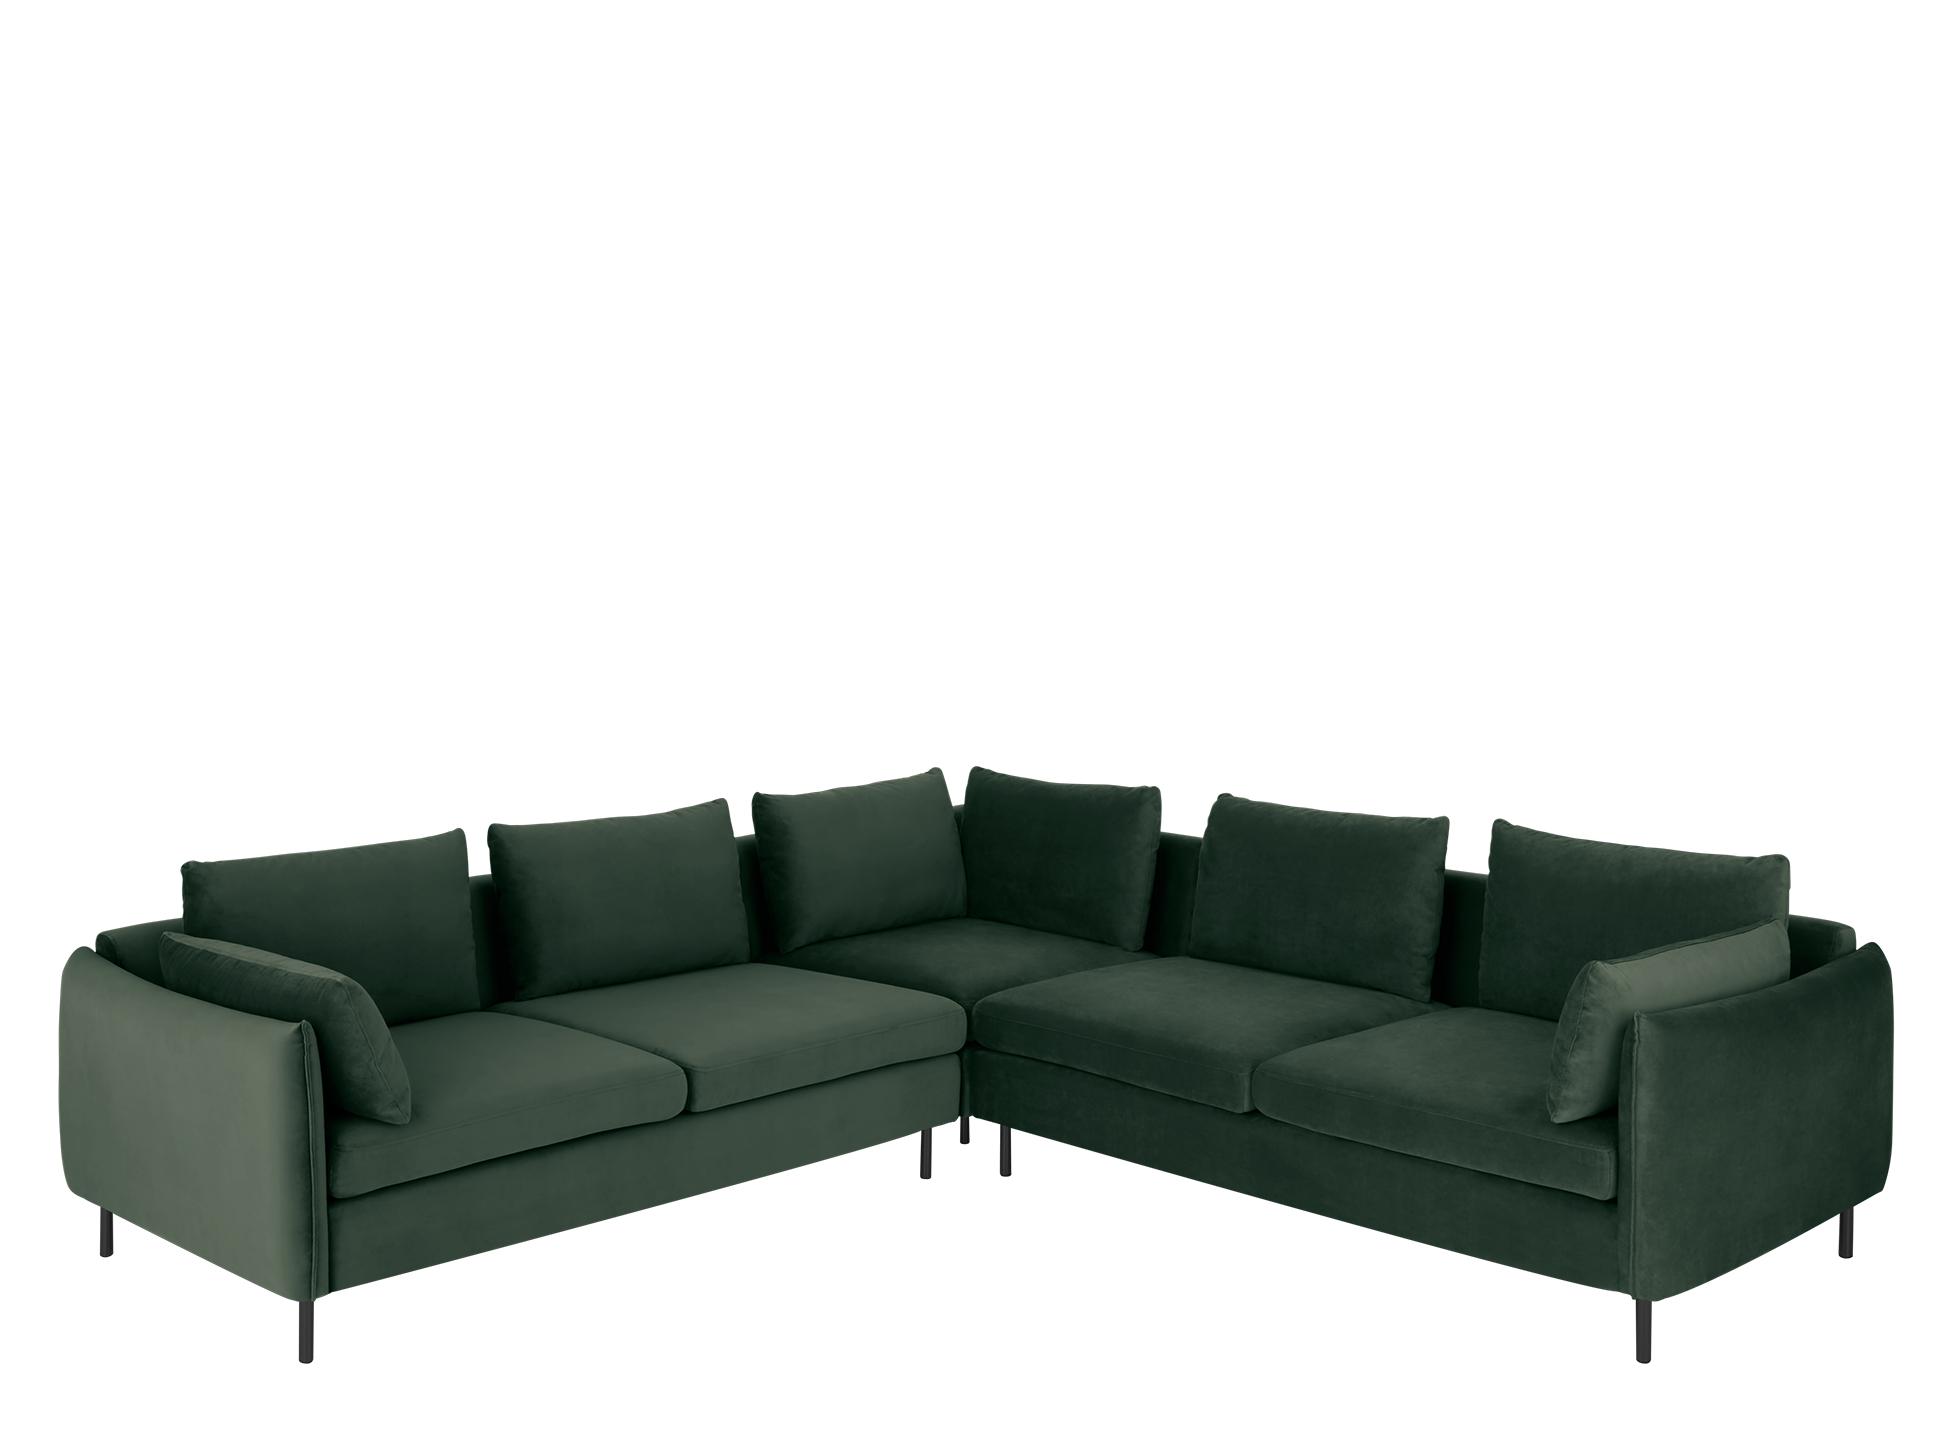 Designer Sofas, Furniture and Homeware